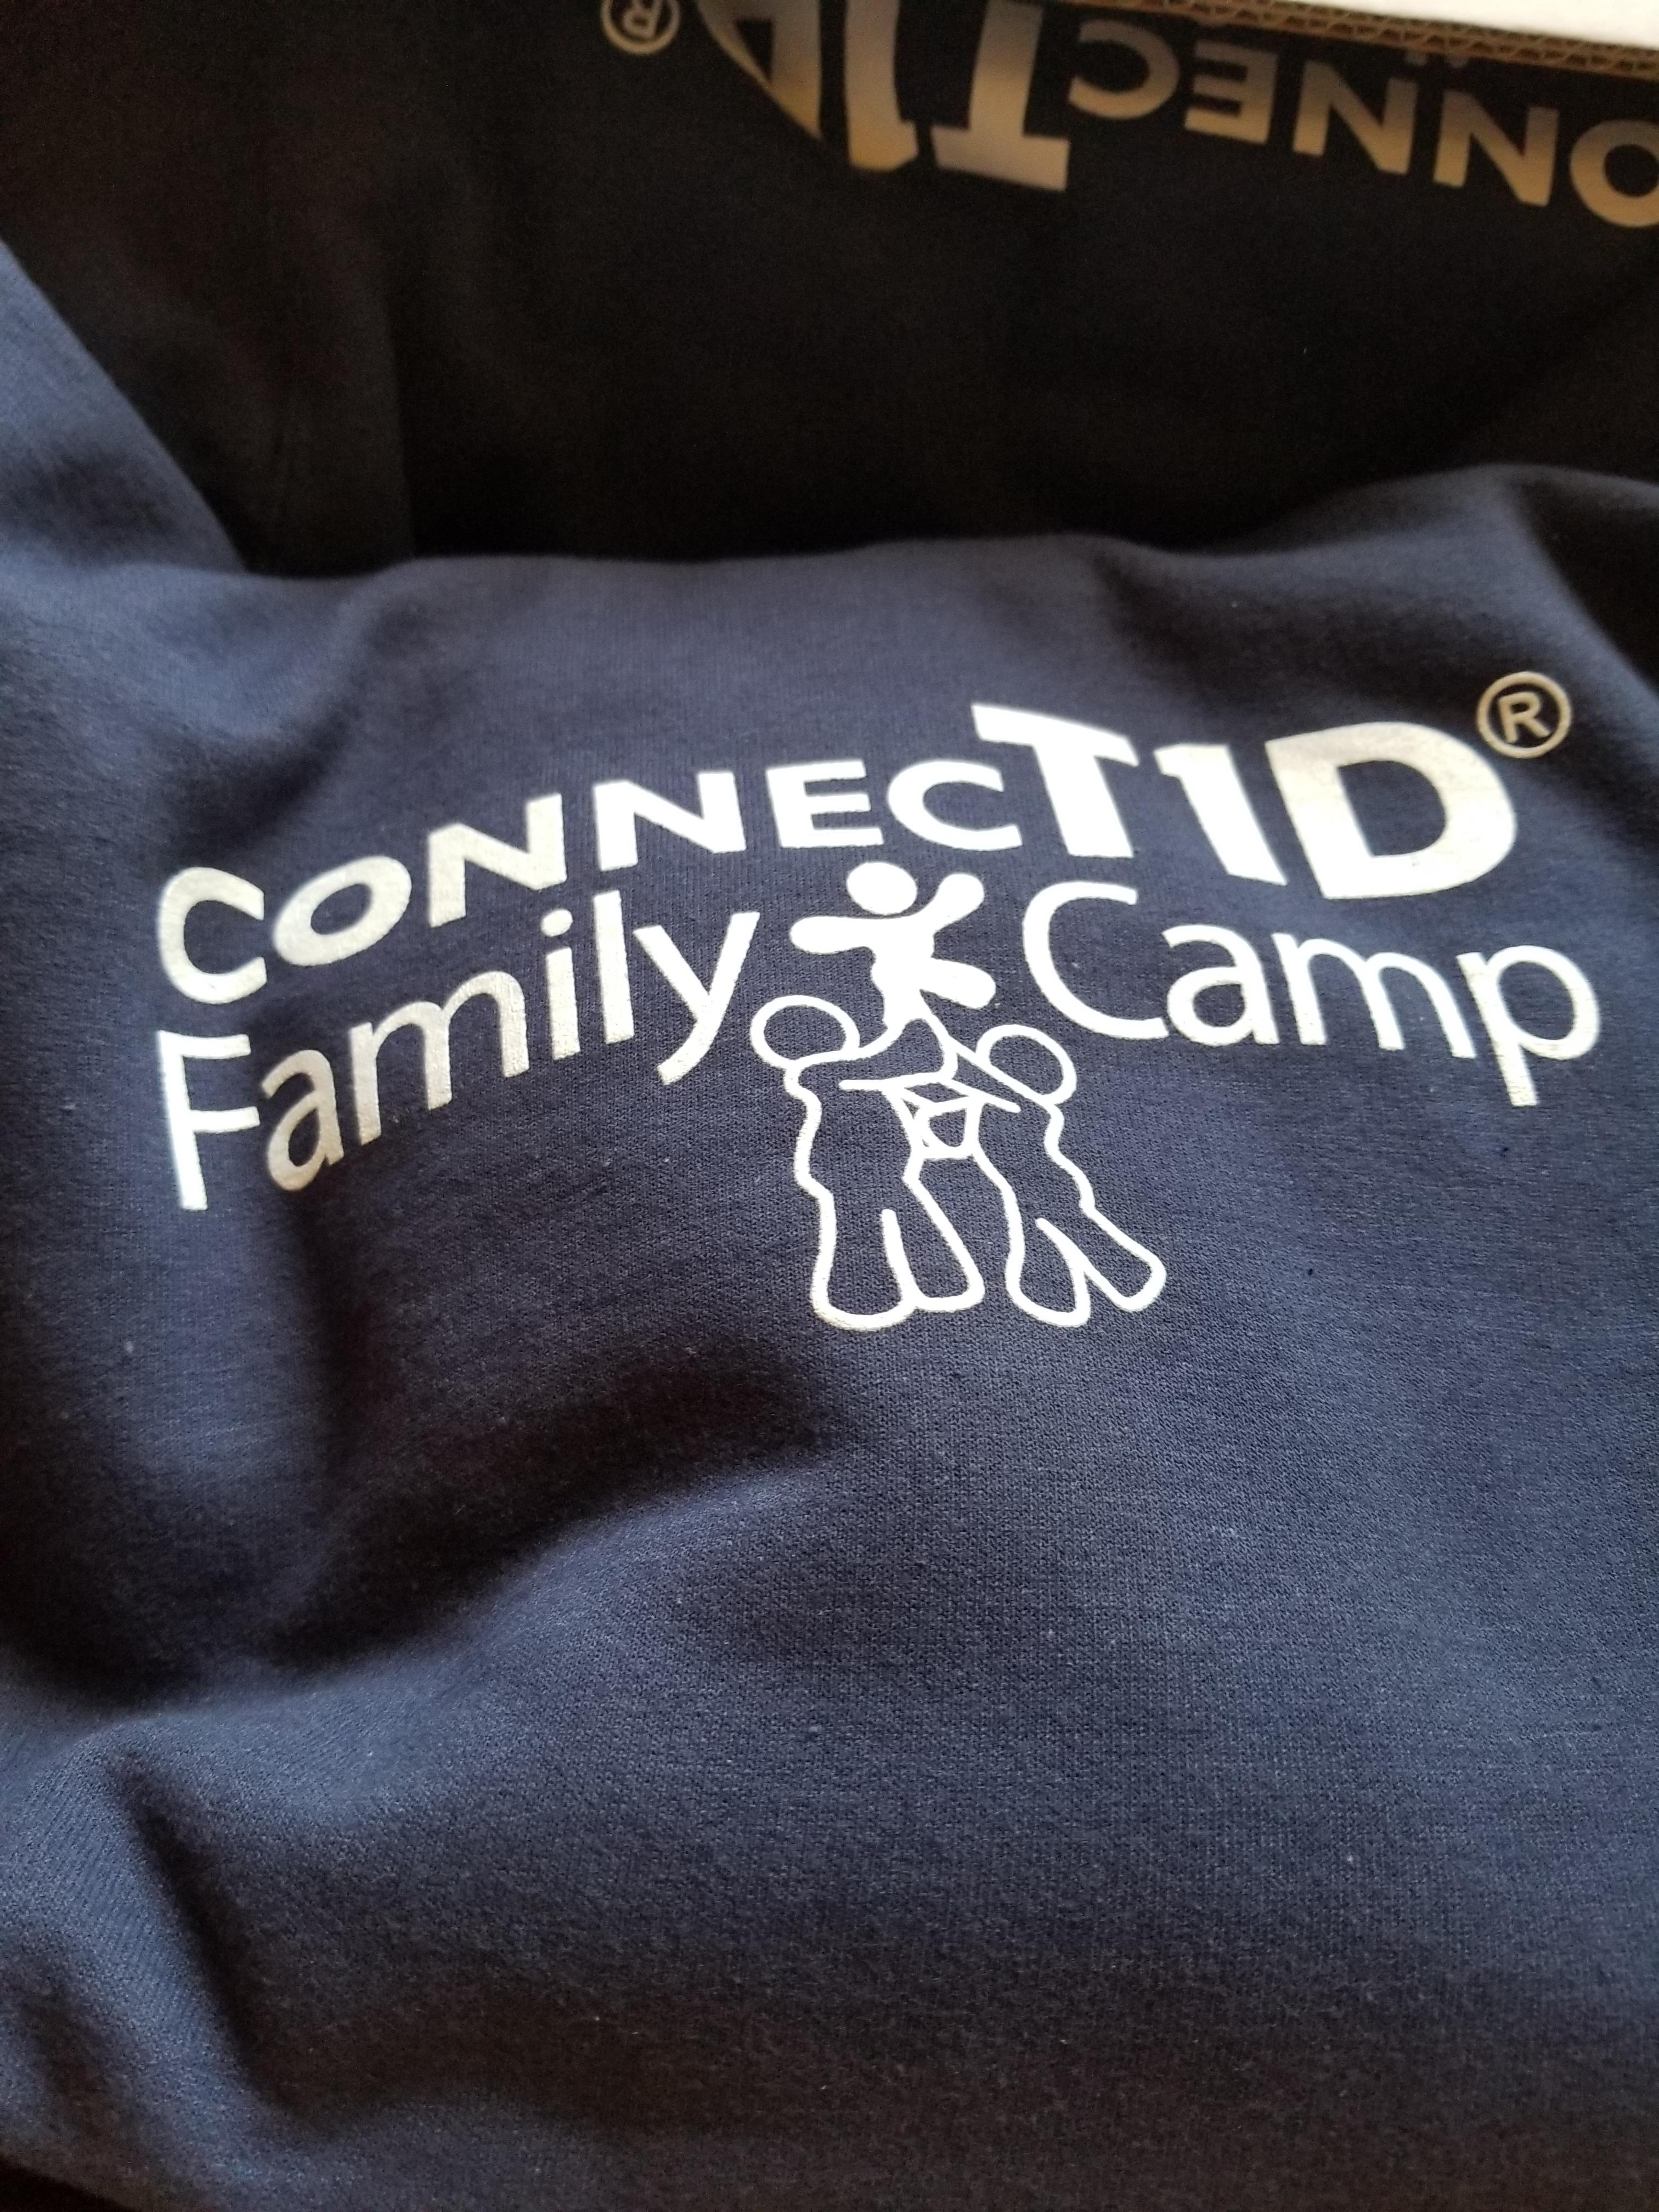 fam camp sweatshirt.jpg